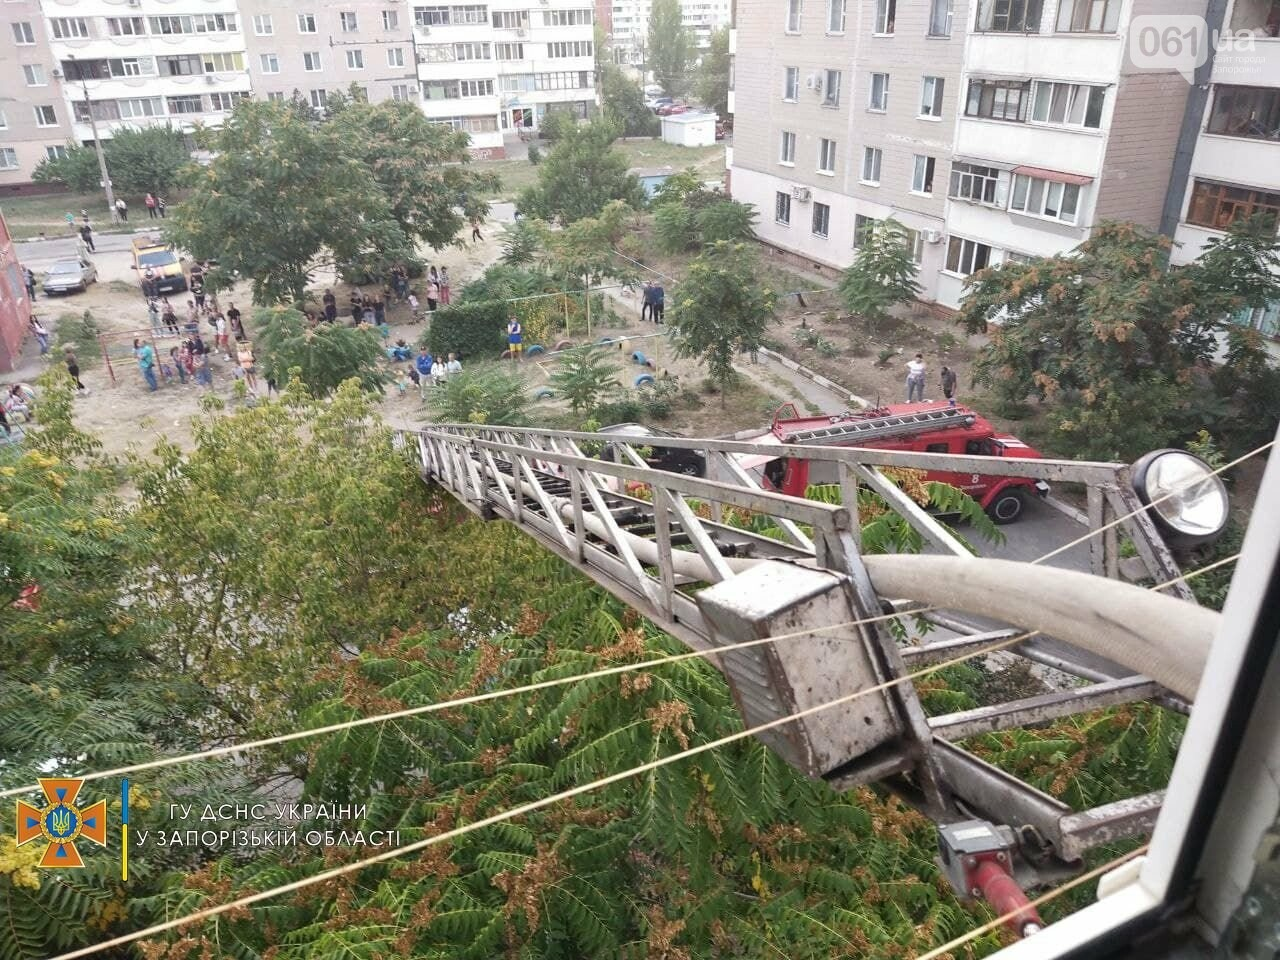 photo2021 09 1210 14 19result 613dd237638bf - В Запорожье 18 спасателей тушили пожар в девятиэтажке, - ФОТО